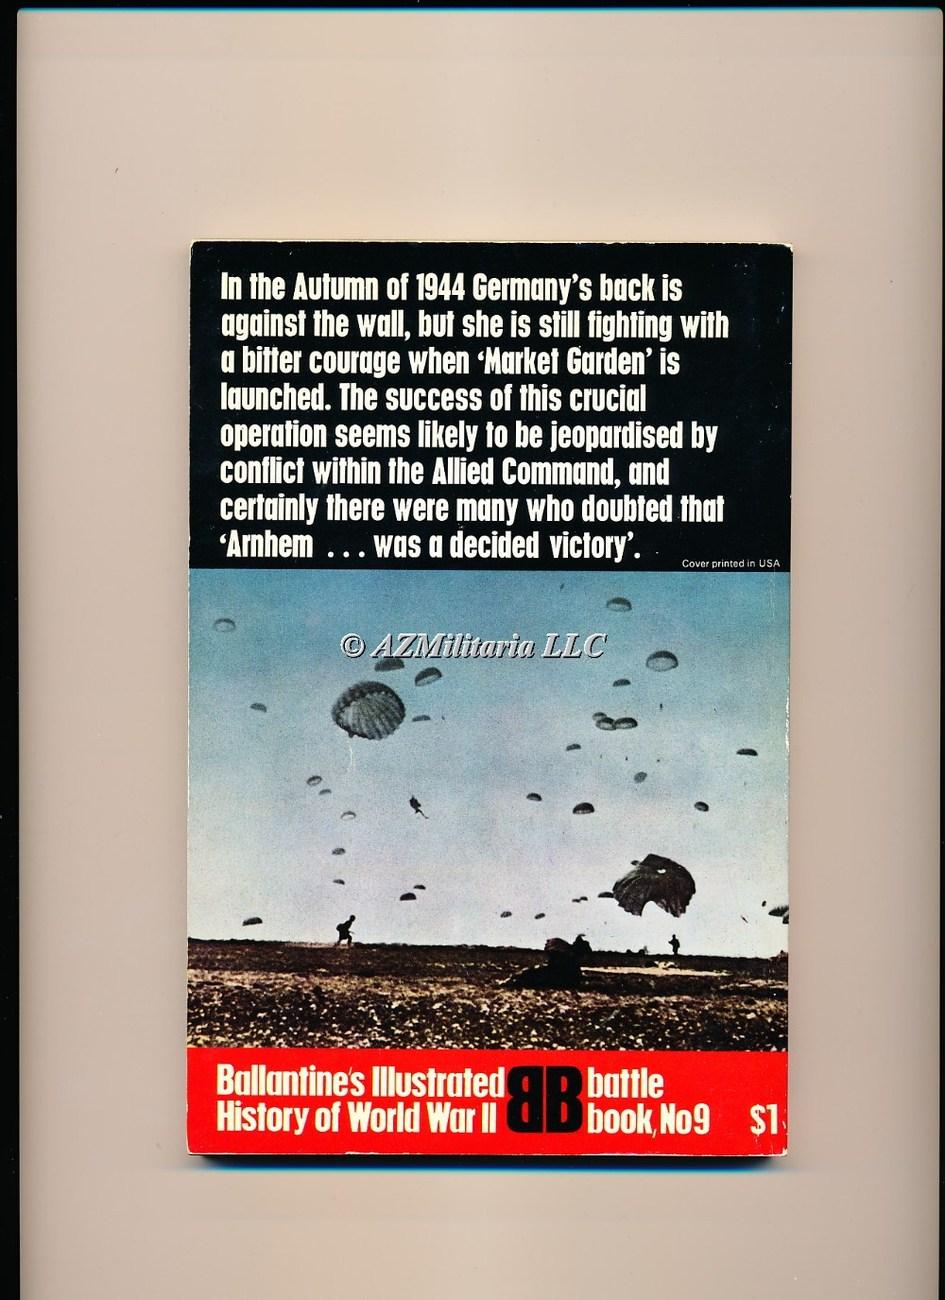 Airborne Carpet Operation Market Basket (Battle Book No 9)